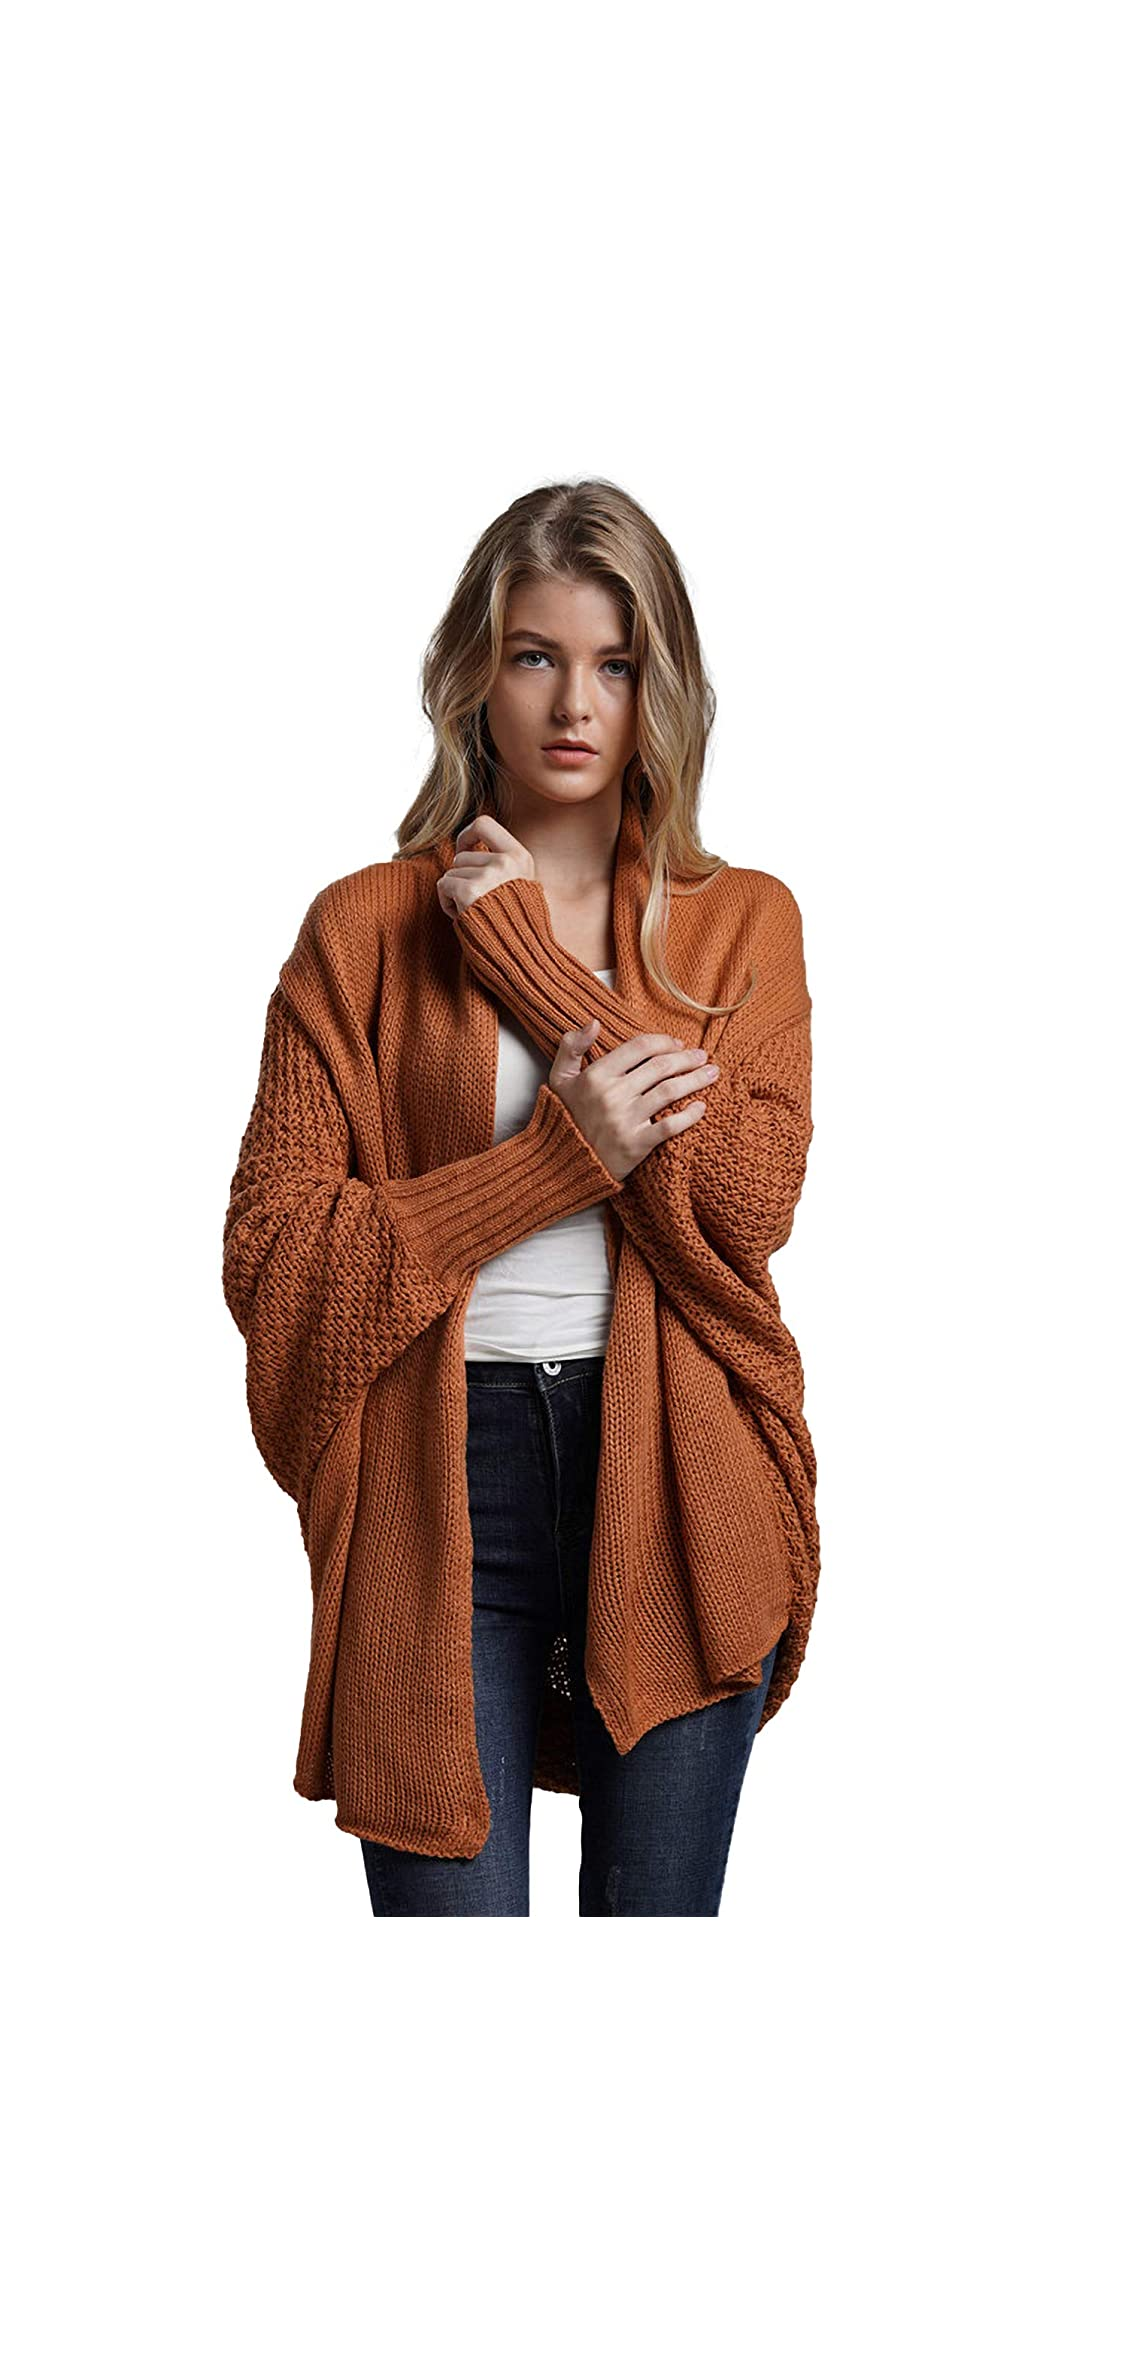 Women's Cardigans Batwing Long Sleeve Knit Sweater Loose